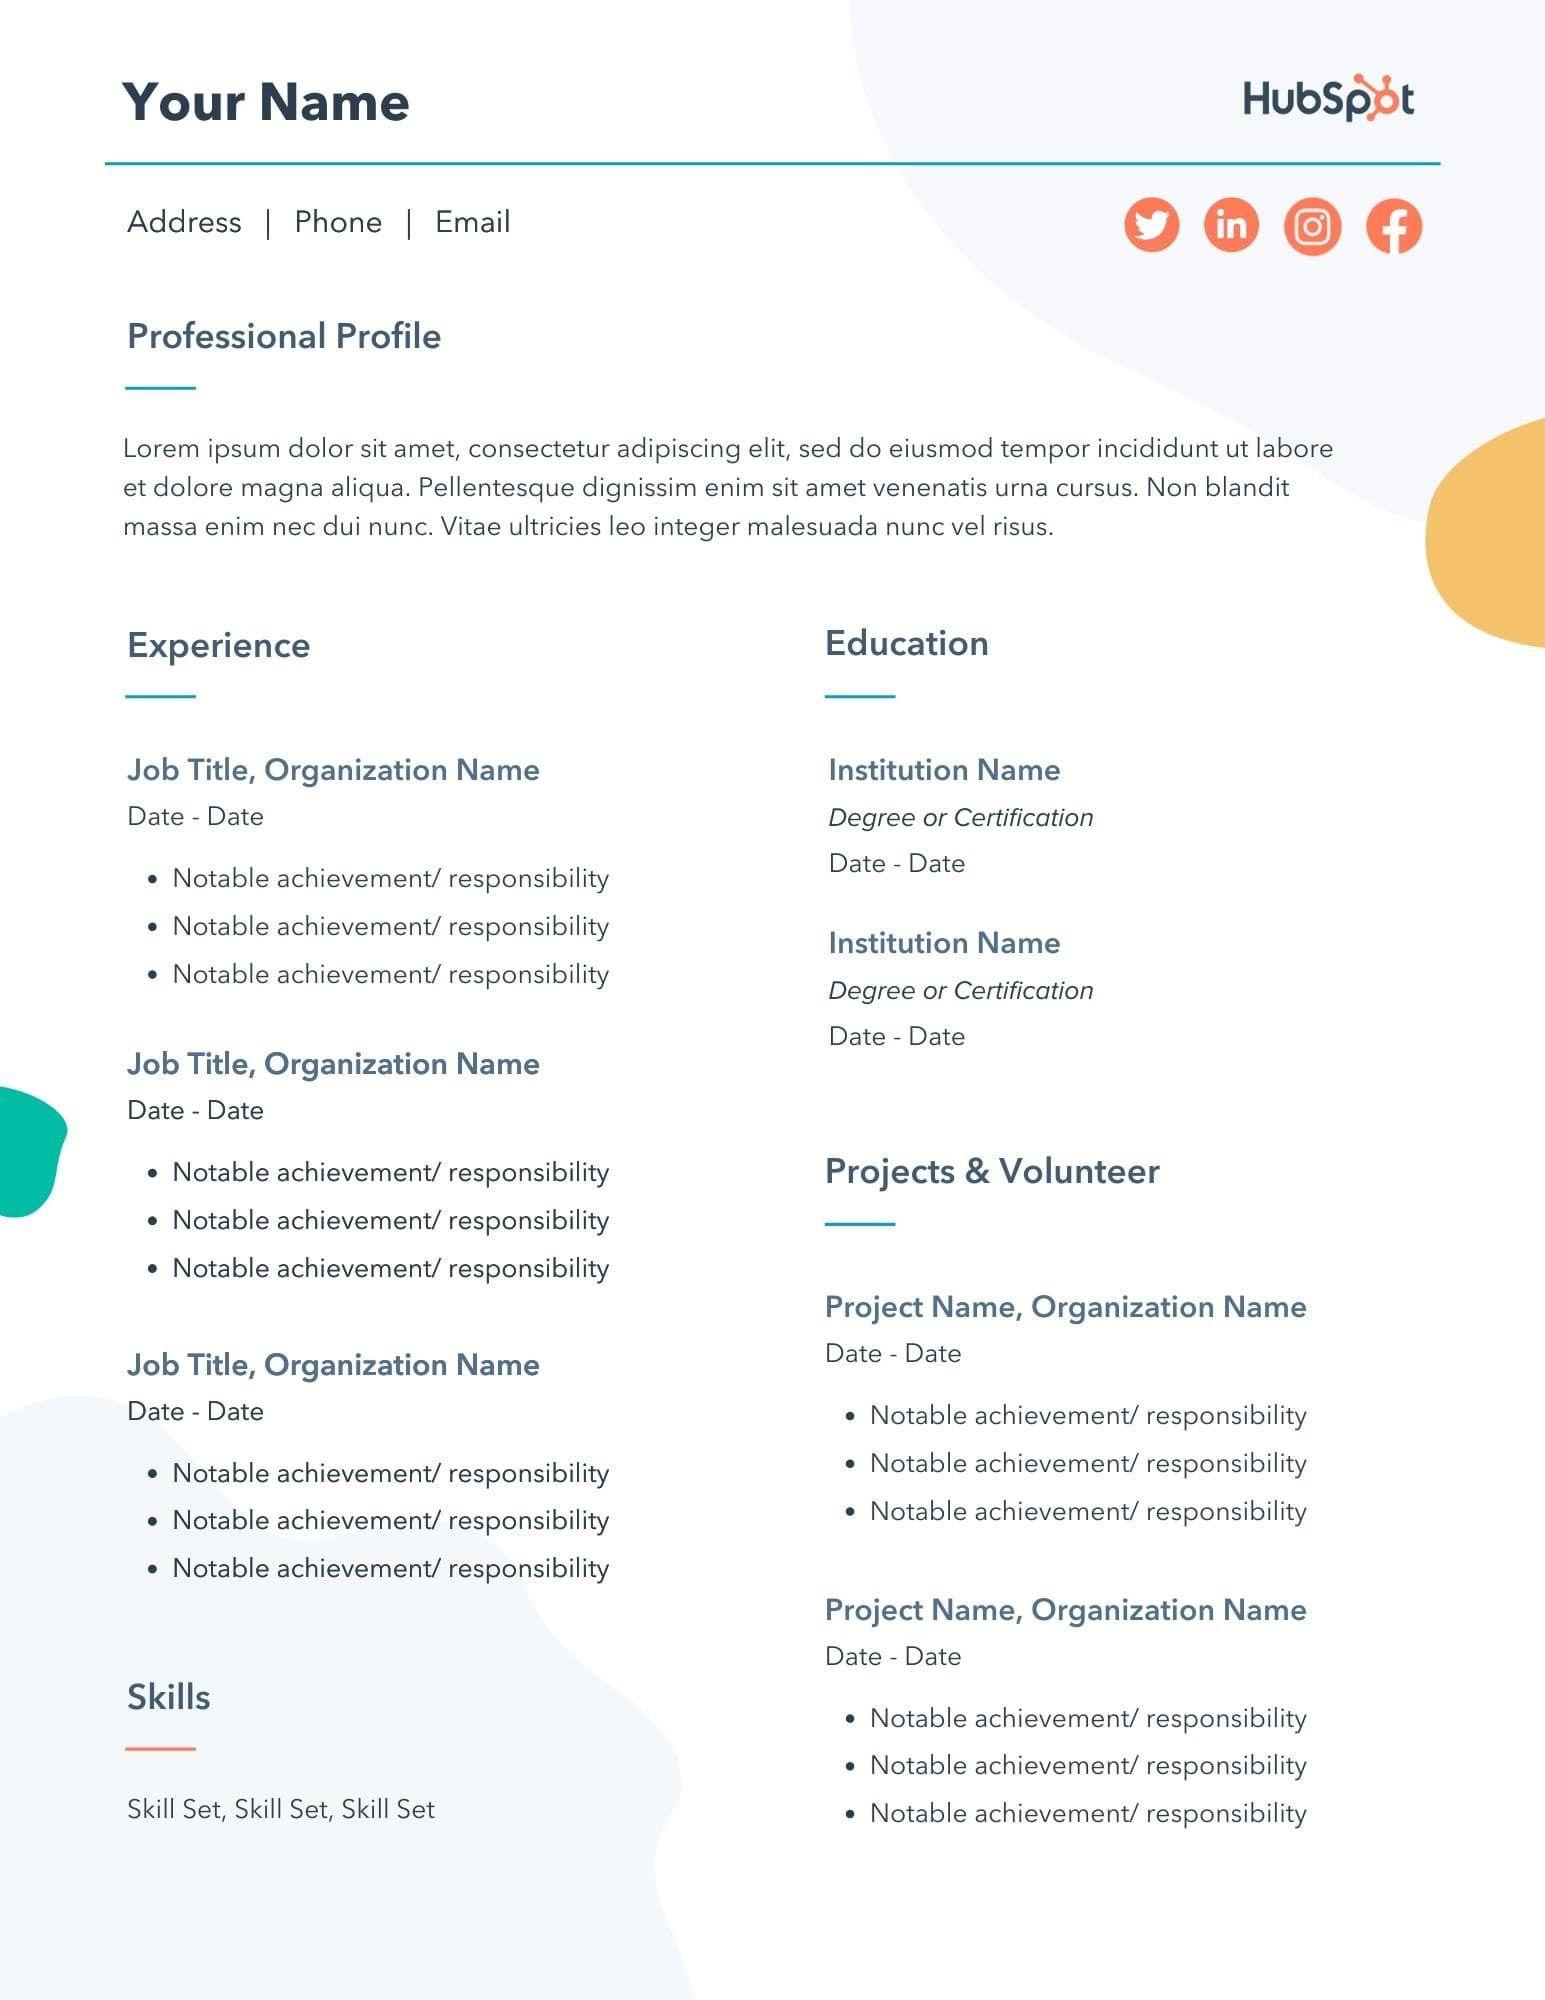 009 Impressive Free Basic Resume Template Download Inspiration  M Word Quora For Microsoft 2010Full